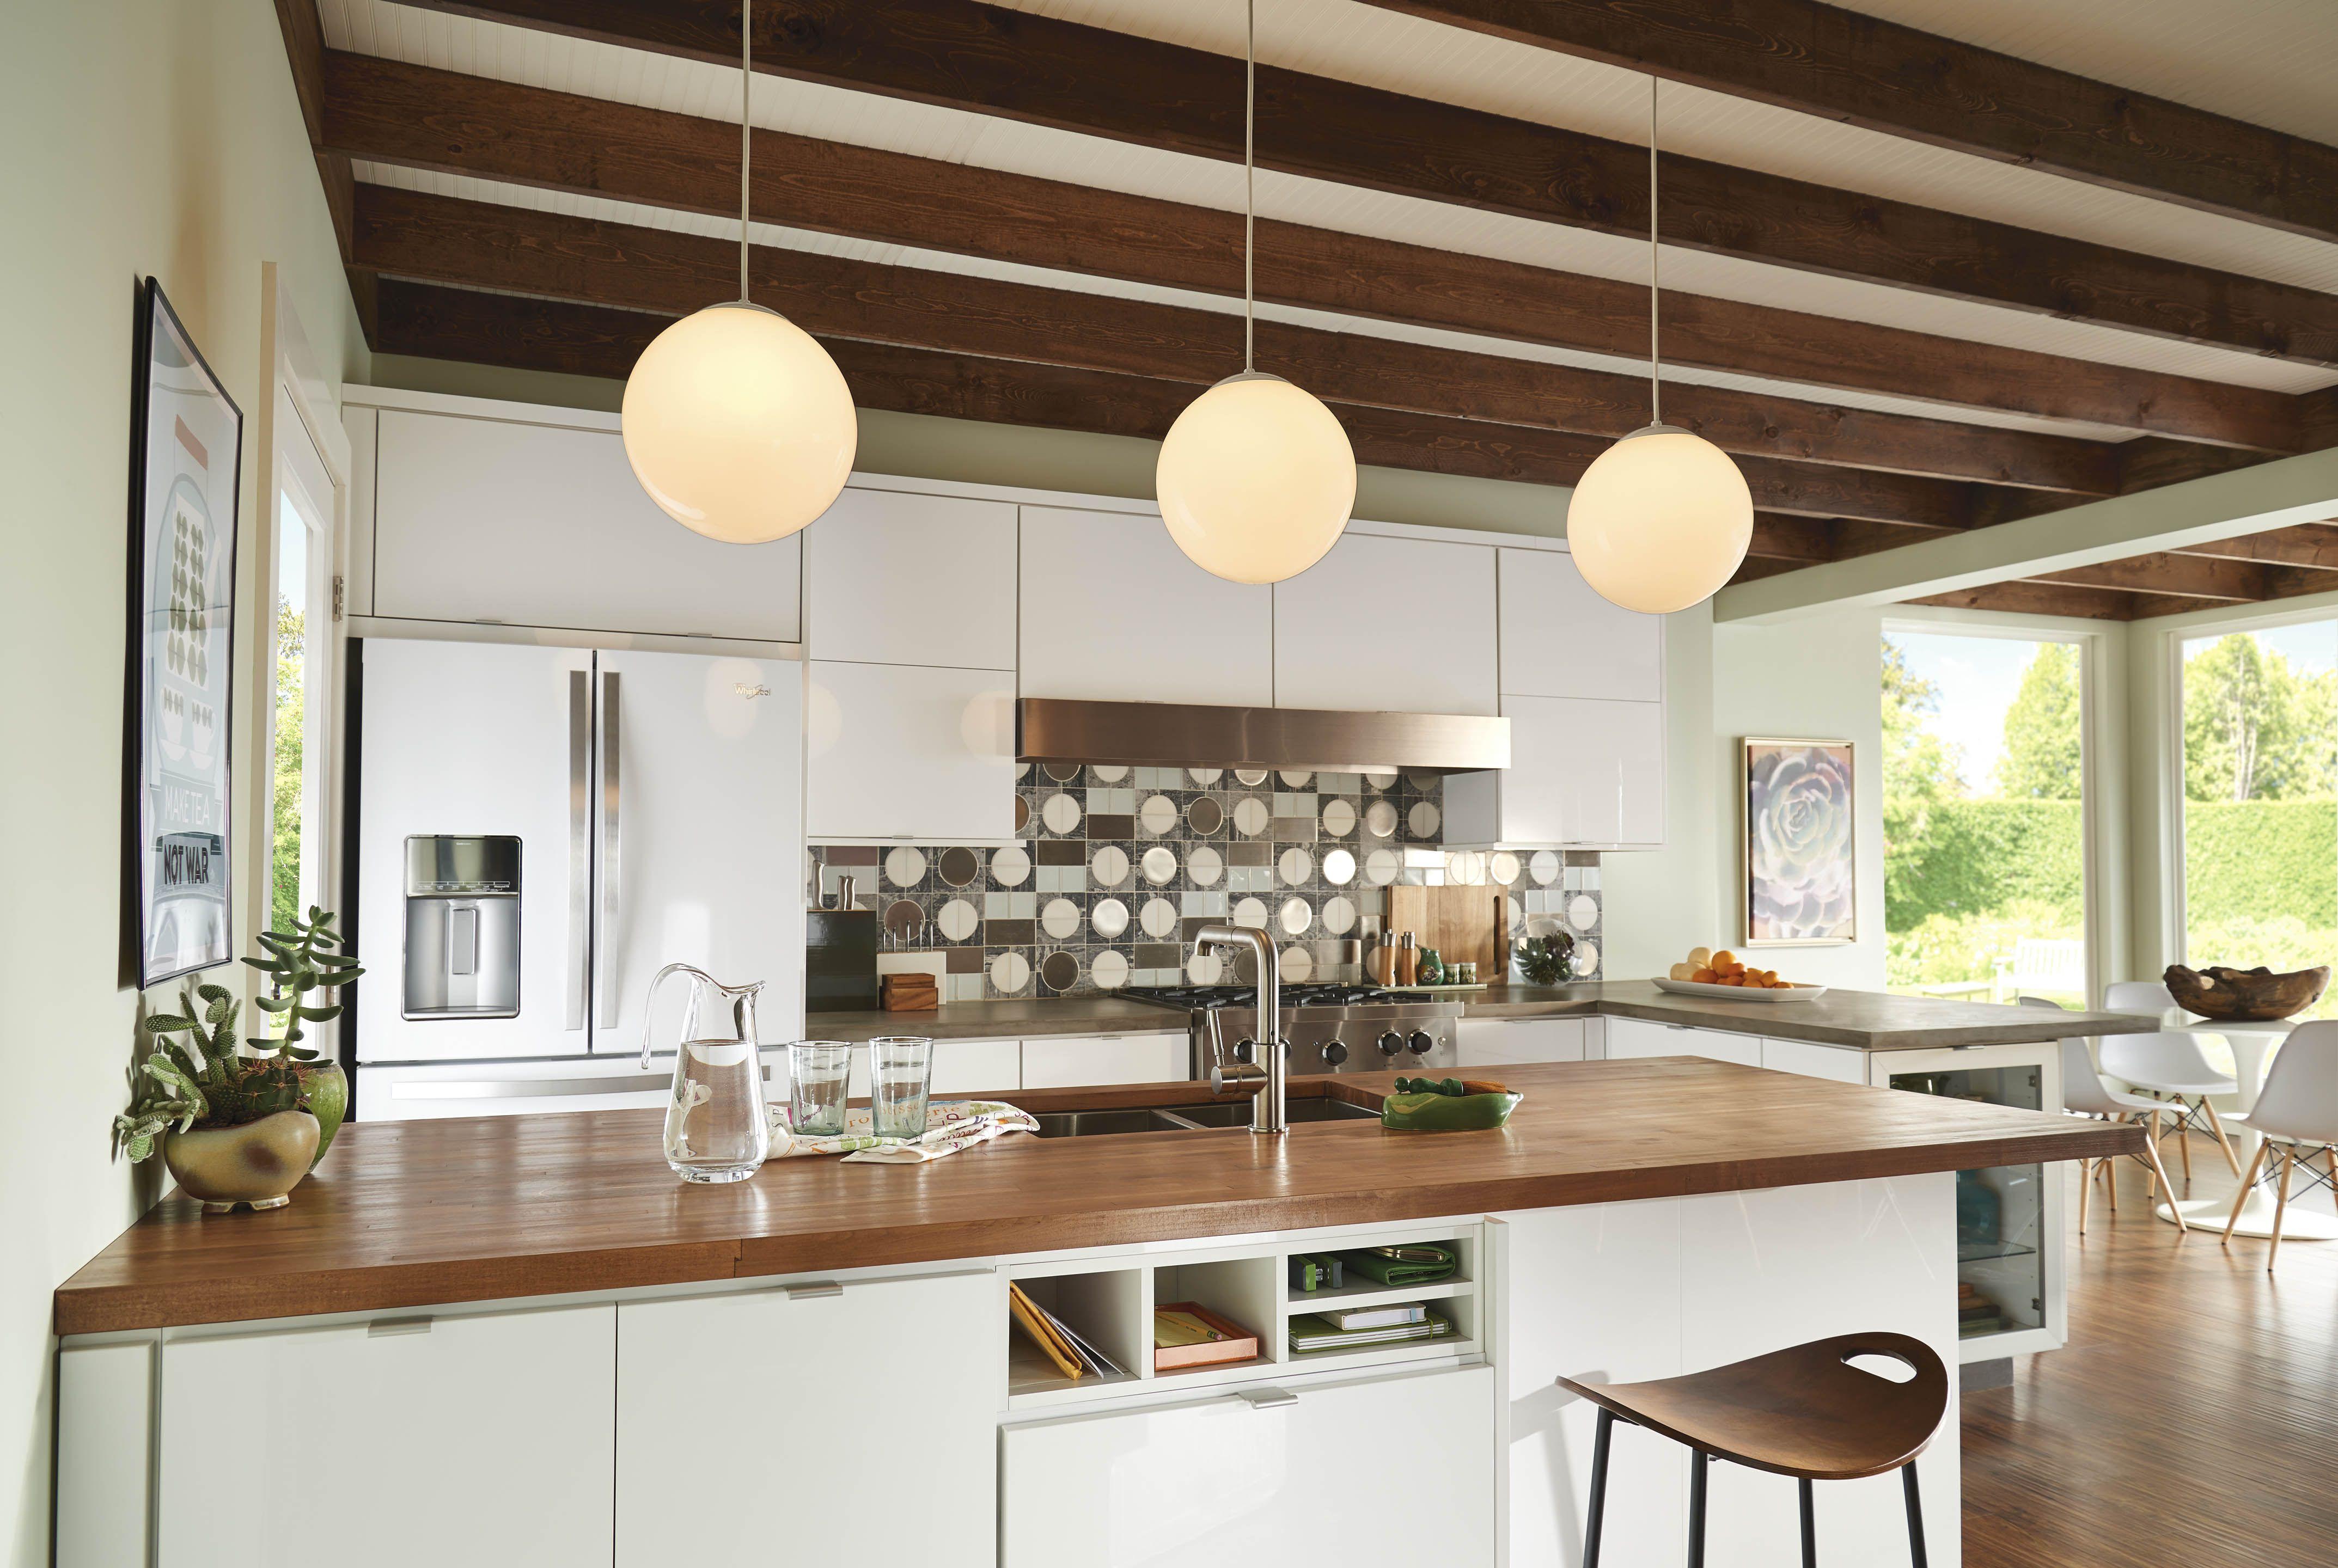 Pin By Ryan Clark On Lighting In 2020 Modern Kitchen Lighting